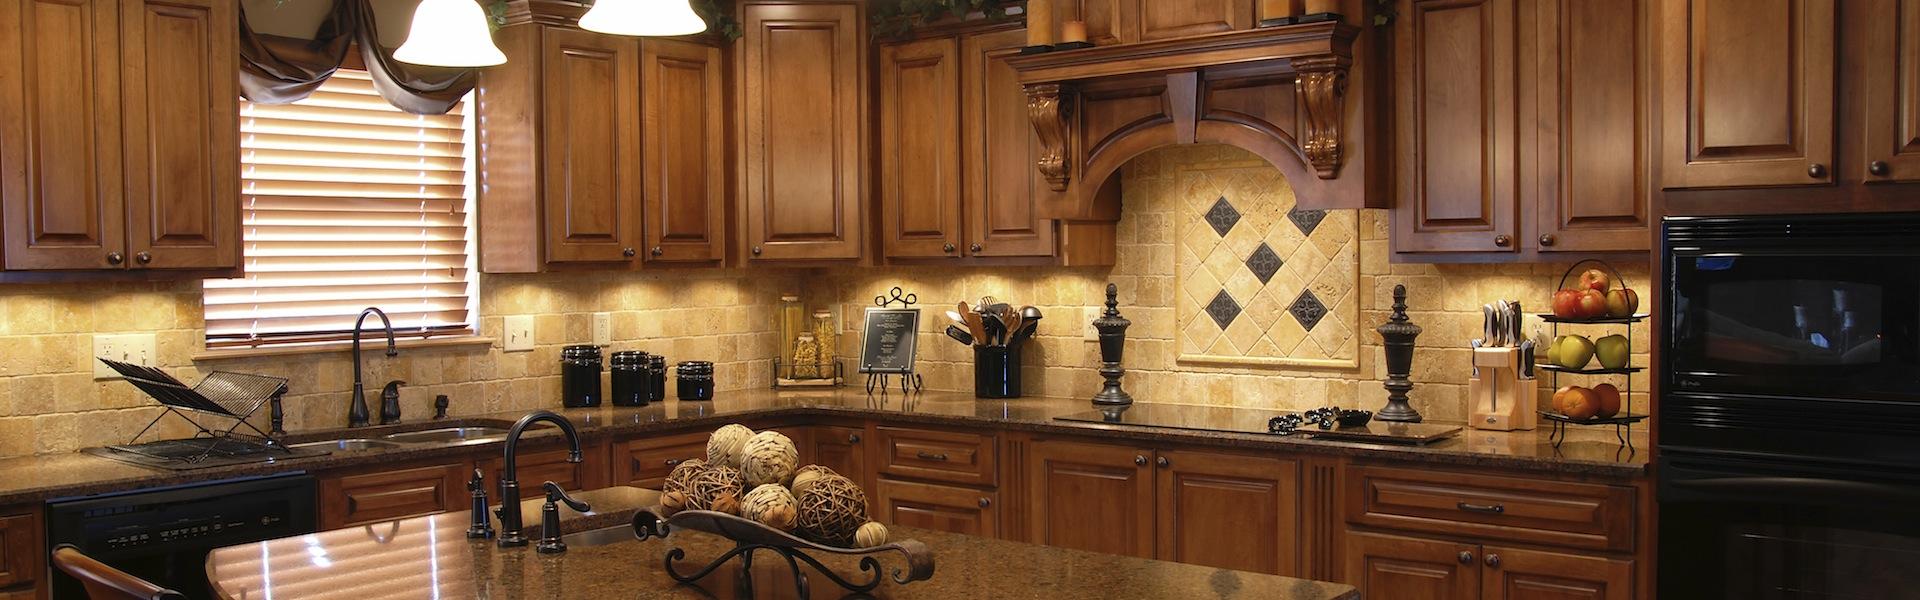 kitchen cabinets custom kitchen cabinets A beautiful interior of a custom kitchen